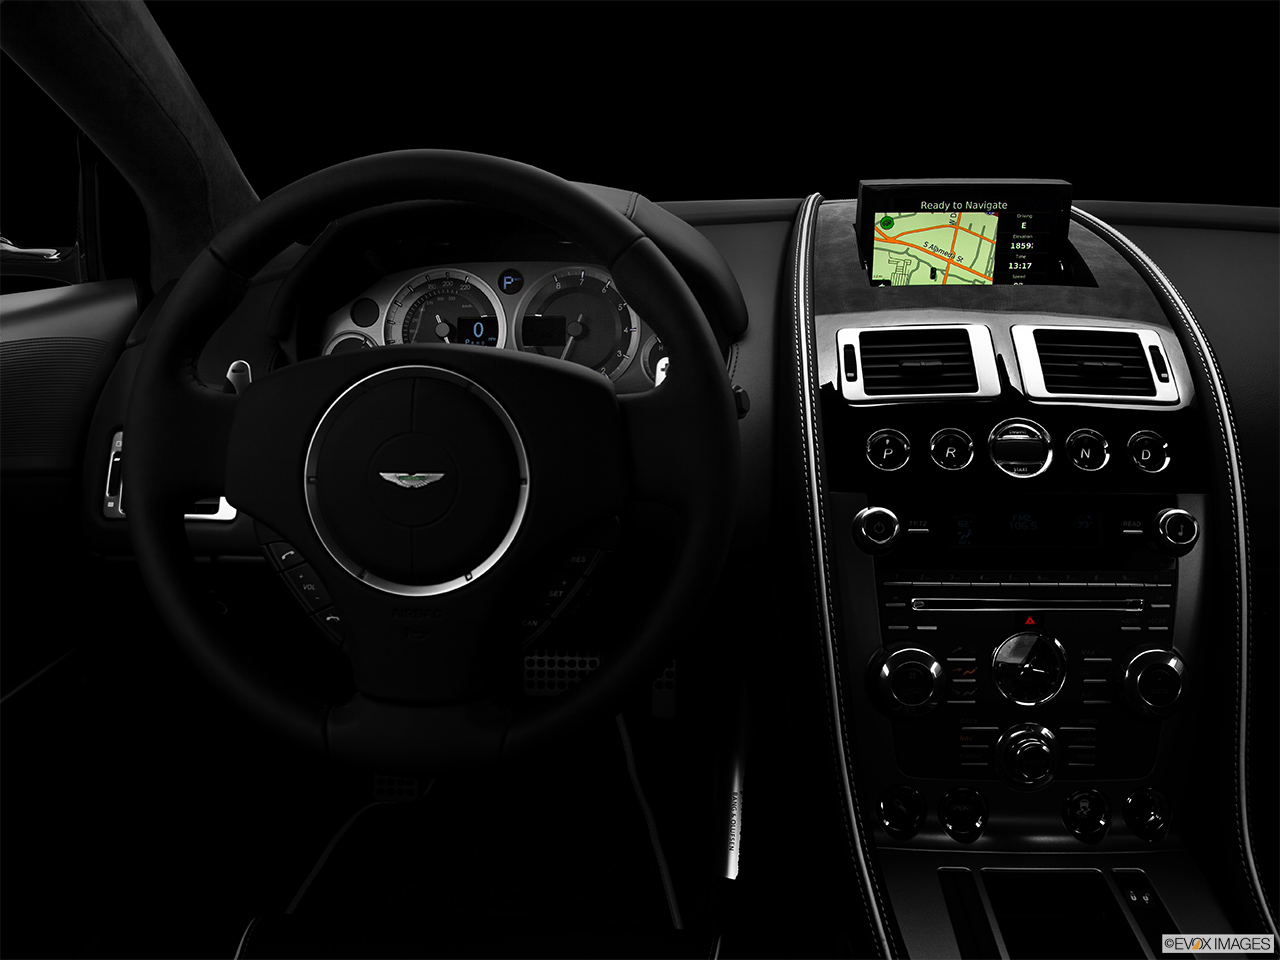 2014 Aston Martin Db9 Coupe Automatic Centered Wide Dash